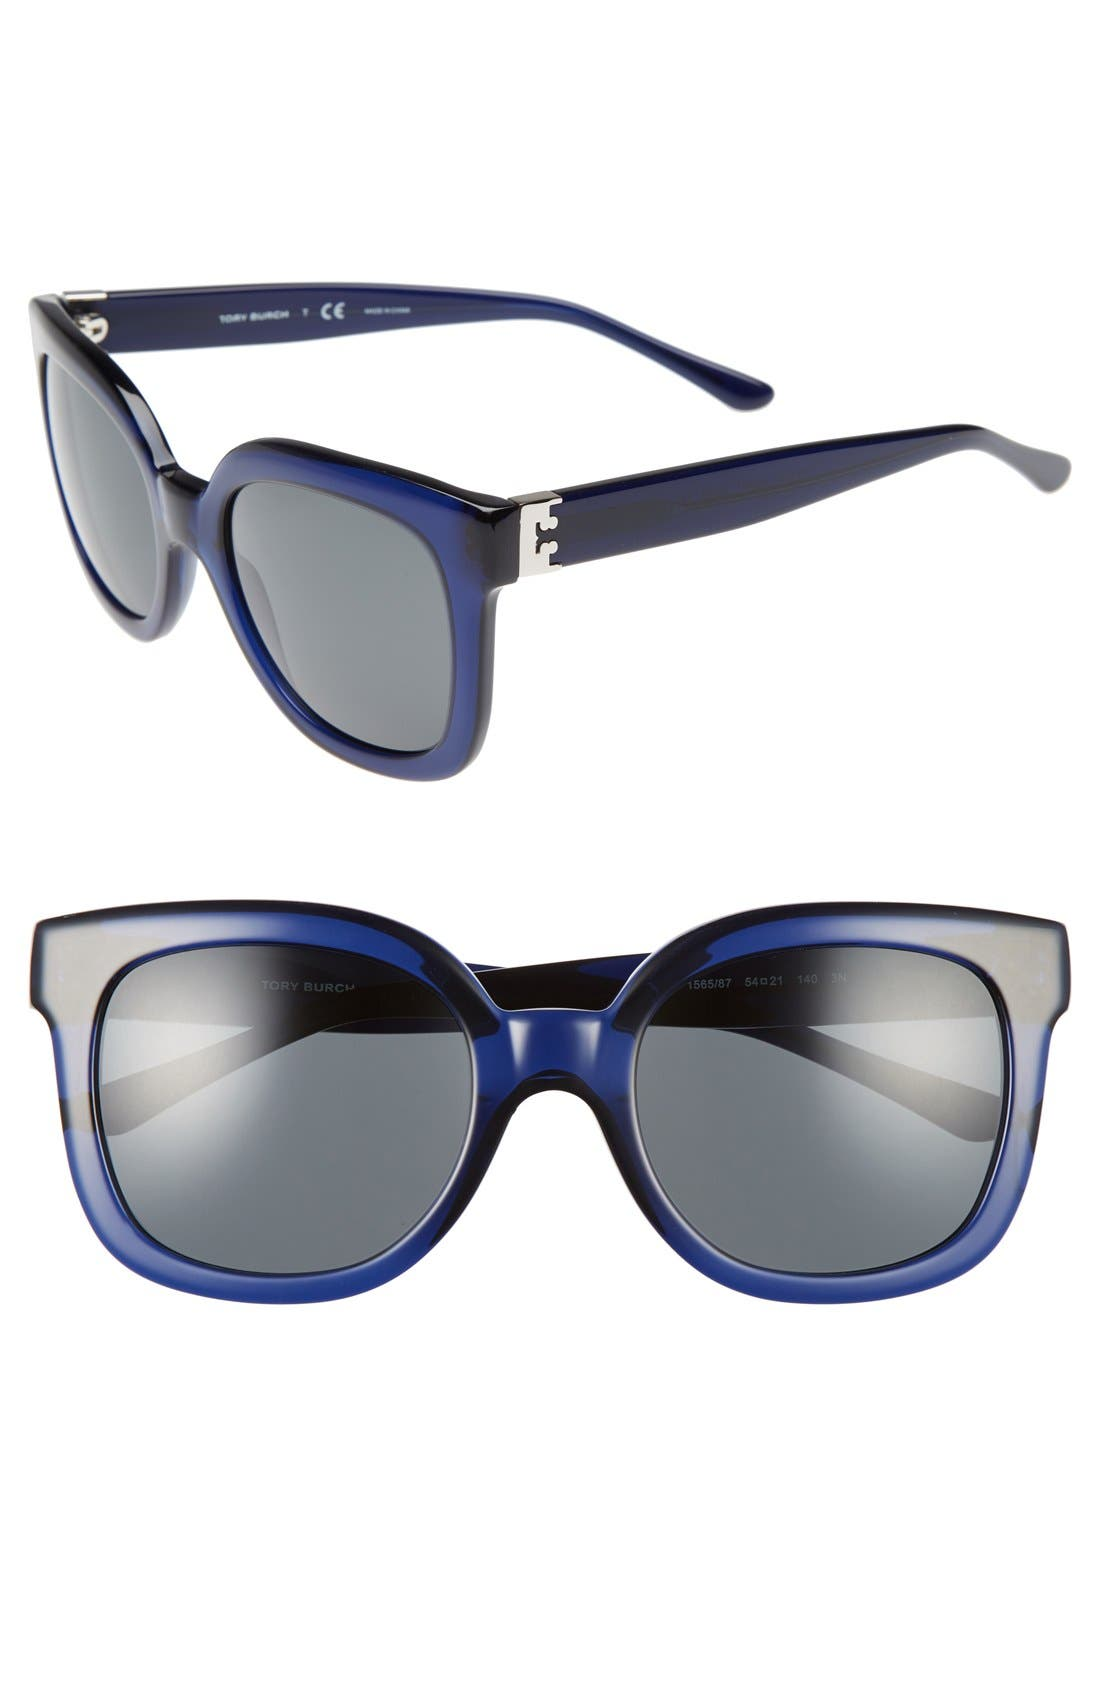 Main Image - Tory Burch 54mm Cat Eye Sunglasses